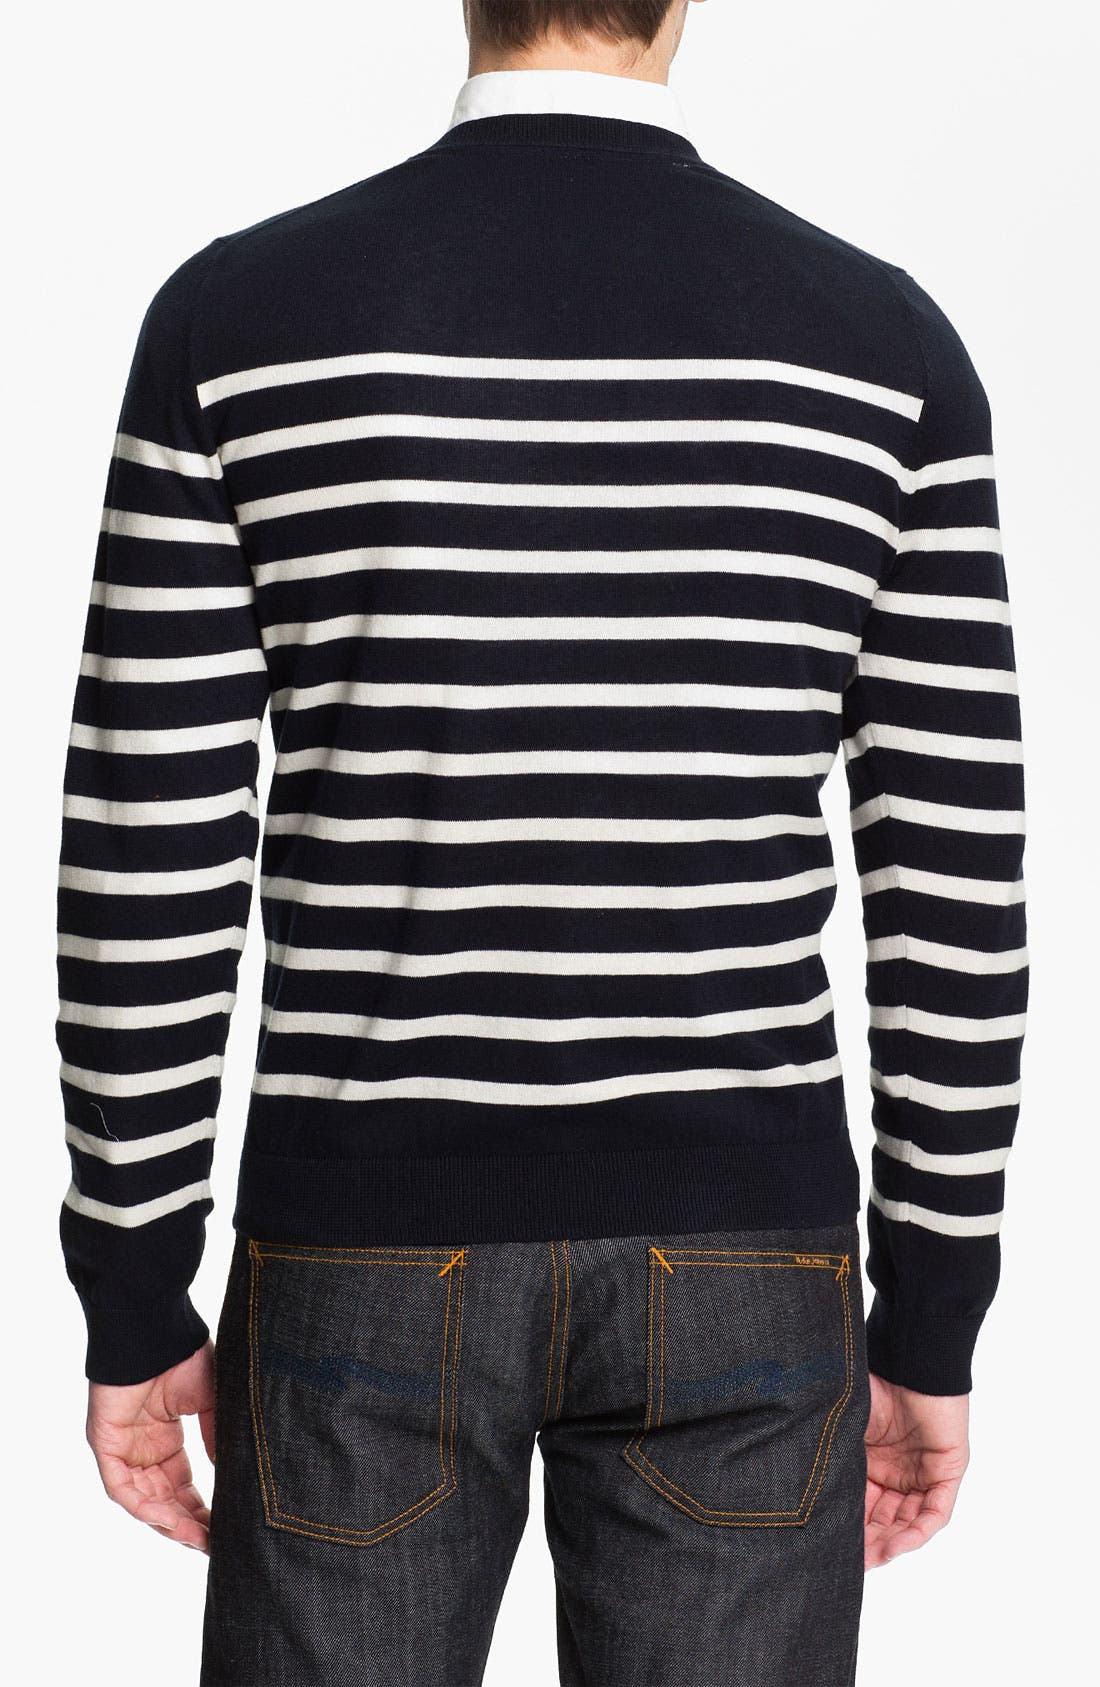 Alternate Image 2  - Wallin & Bros. 'Drayton Stripe' Crewneck Sweater